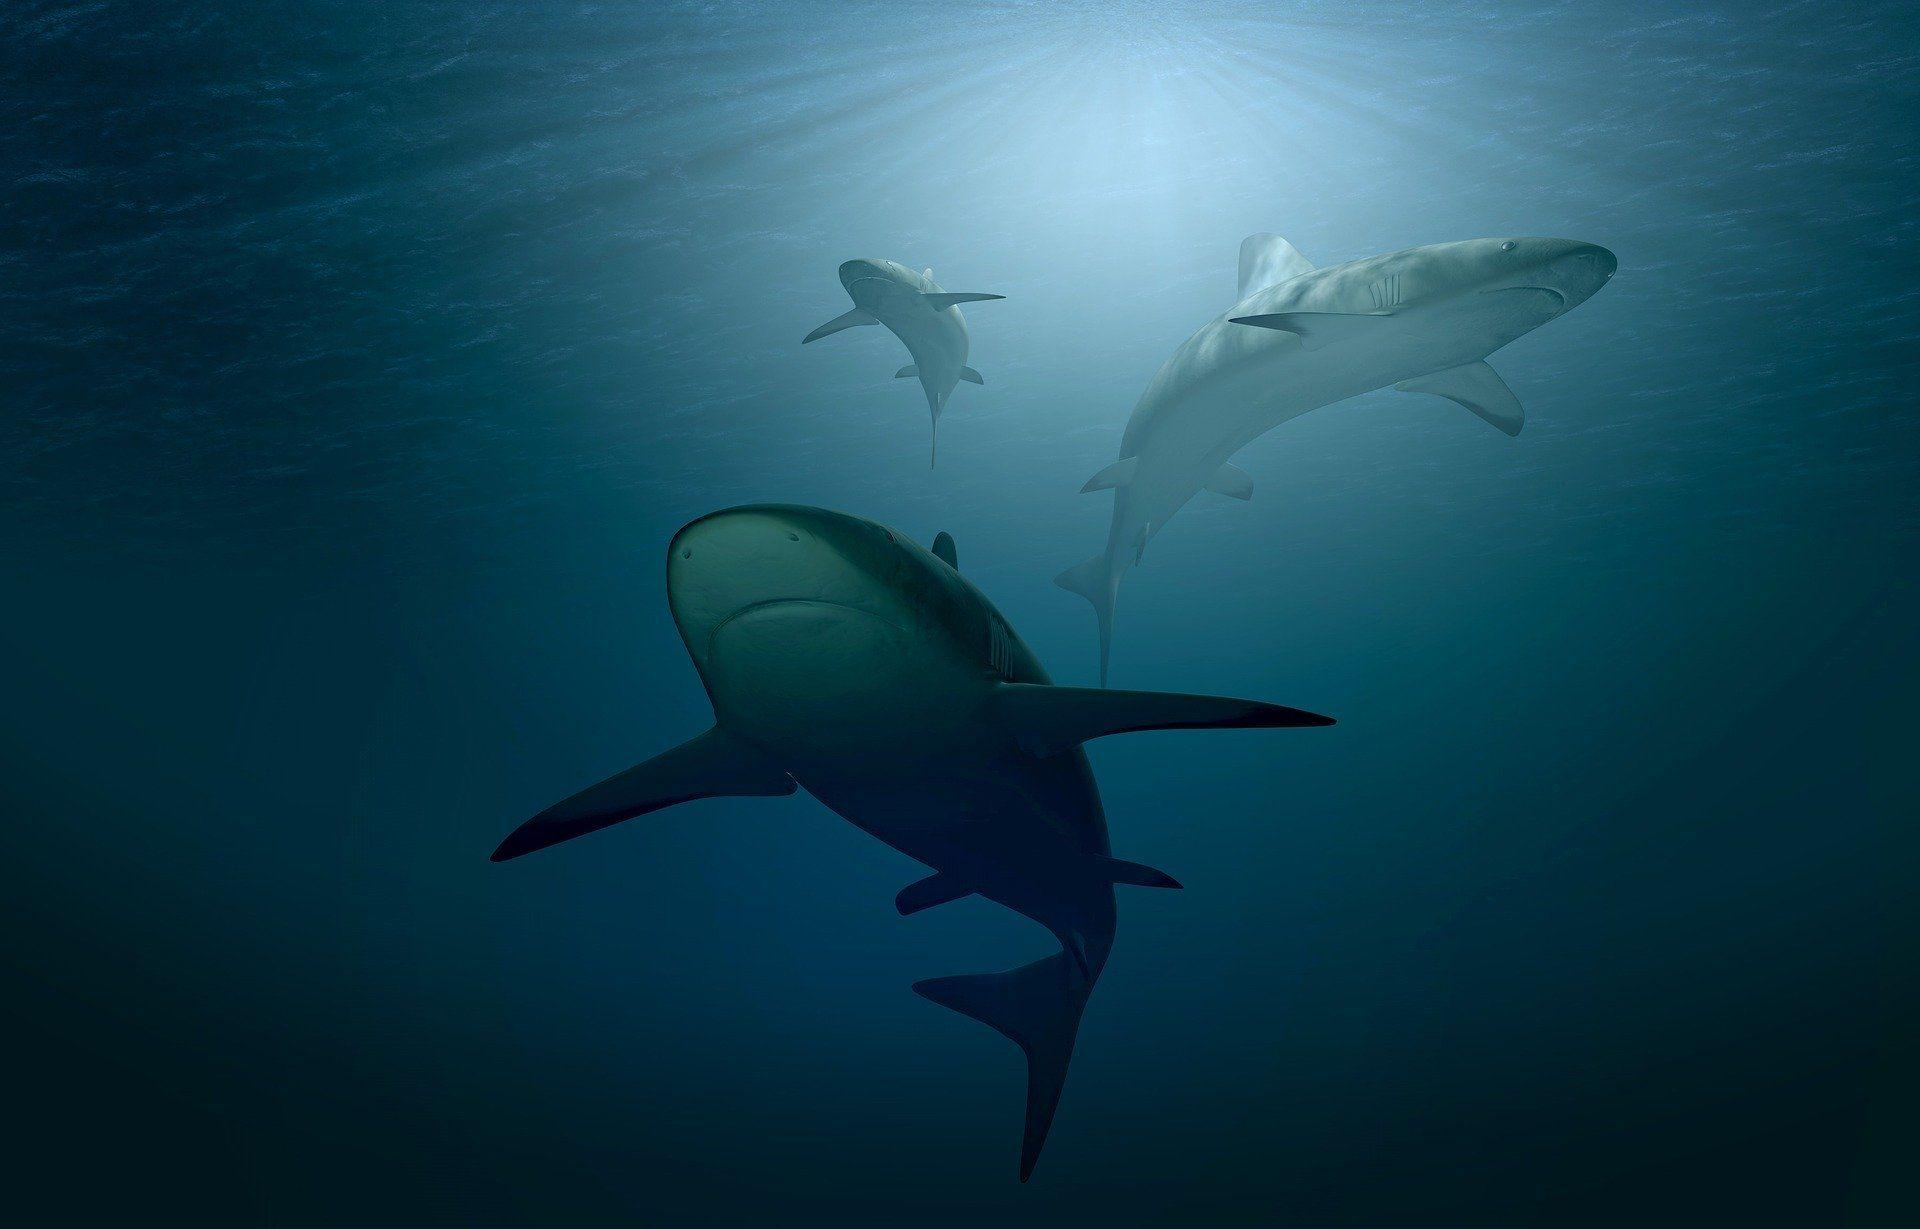 Смотреть гигантских акул онлайн